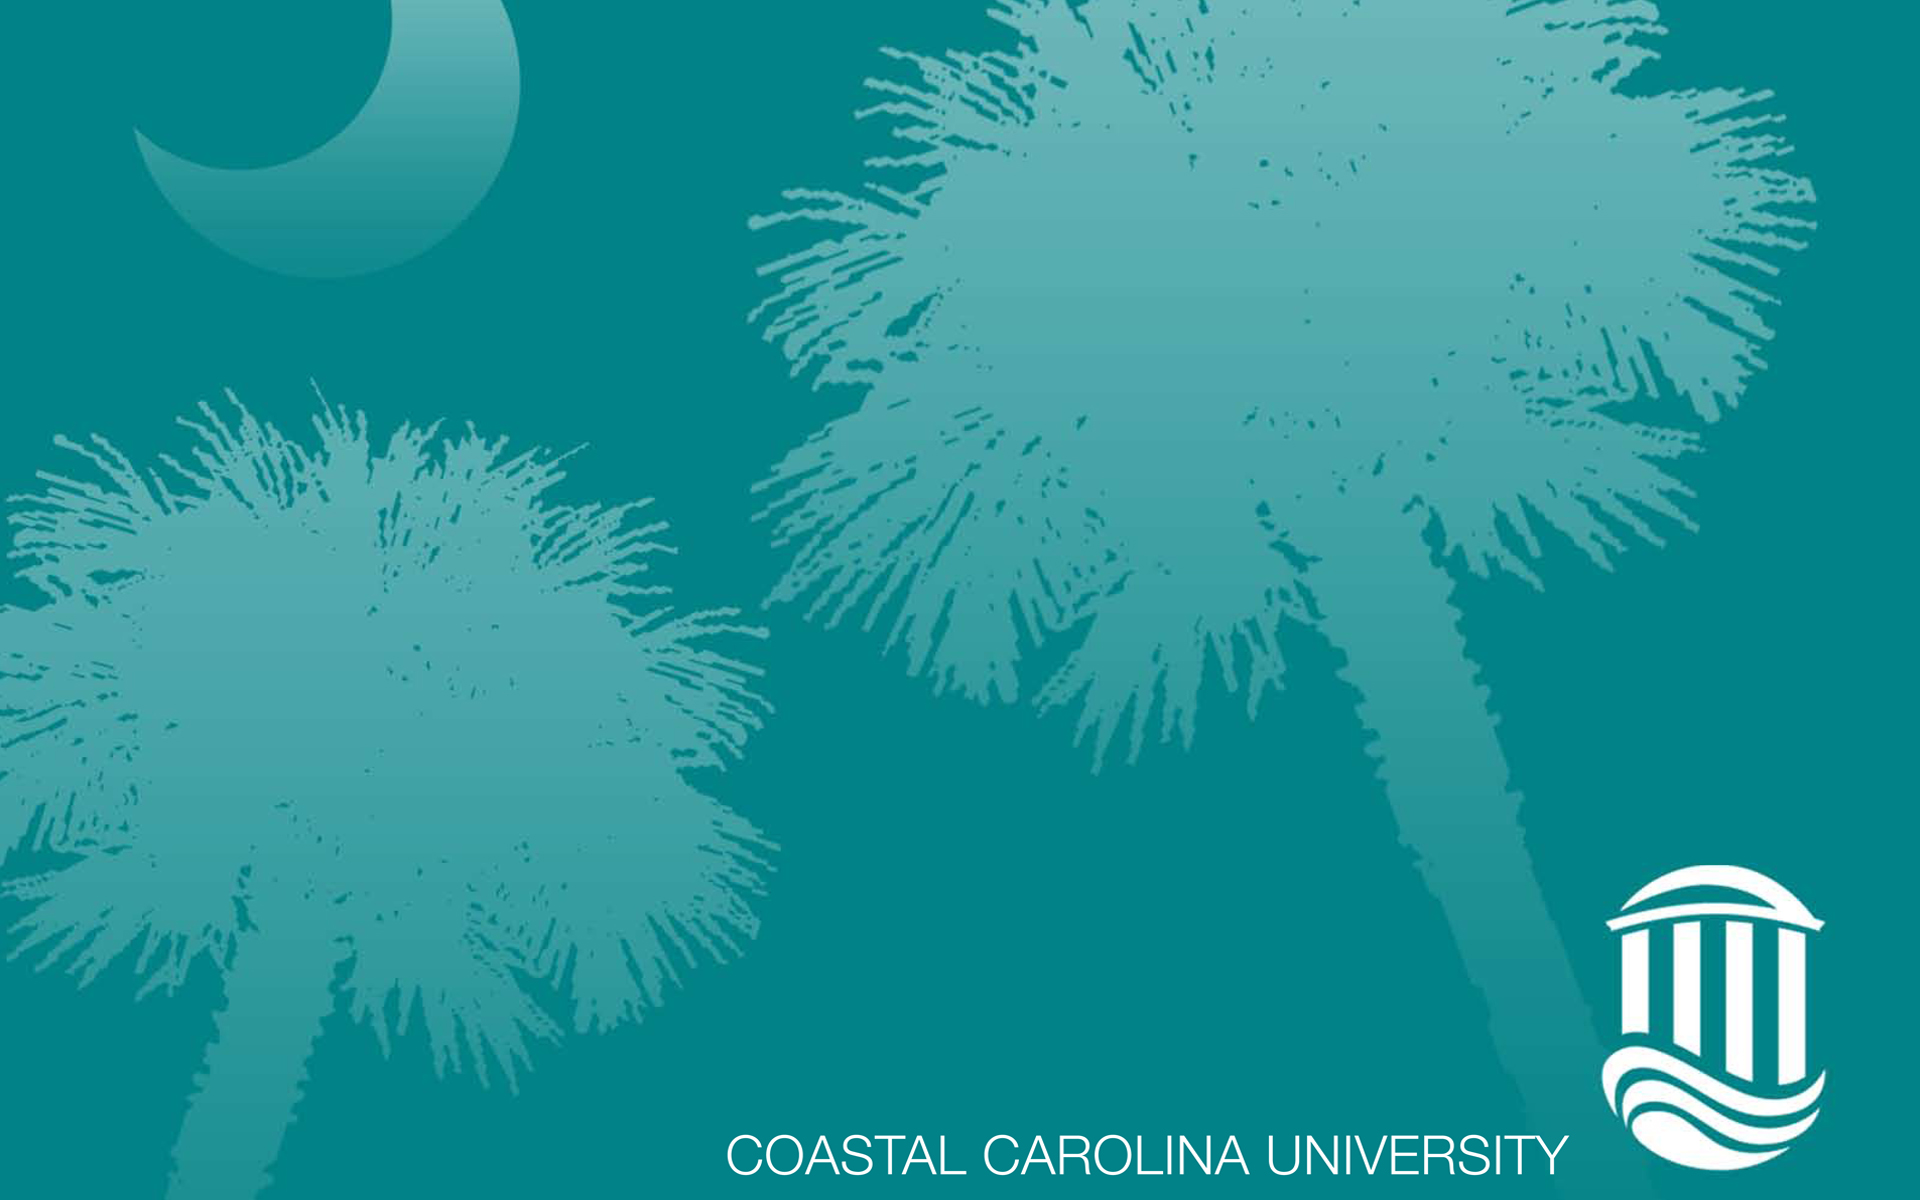 Coastal Carolina Wallpapers Wallpapersafari HD Wallpapers Download Free Images Wallpaper [1000image.com]